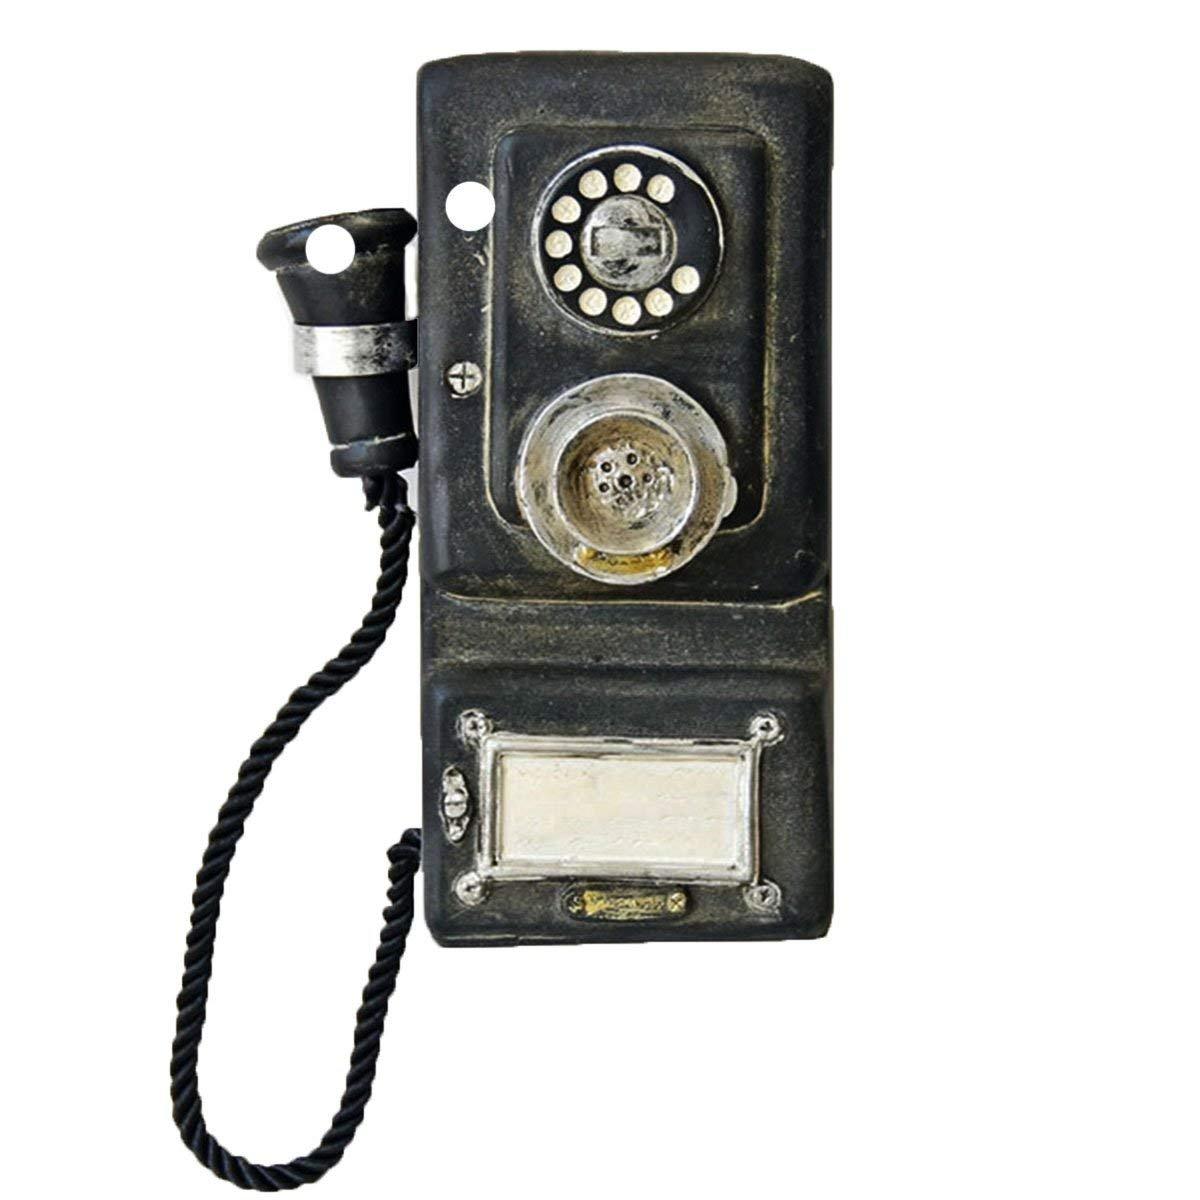 VintageBee Antique Phone Model Resin Vintage Decorative Telephones Old Creative Fashion Retro Phone Wall Hanging Vintage Decorative Phone Model Bar Tea Shop Decoration 80x40x210mm